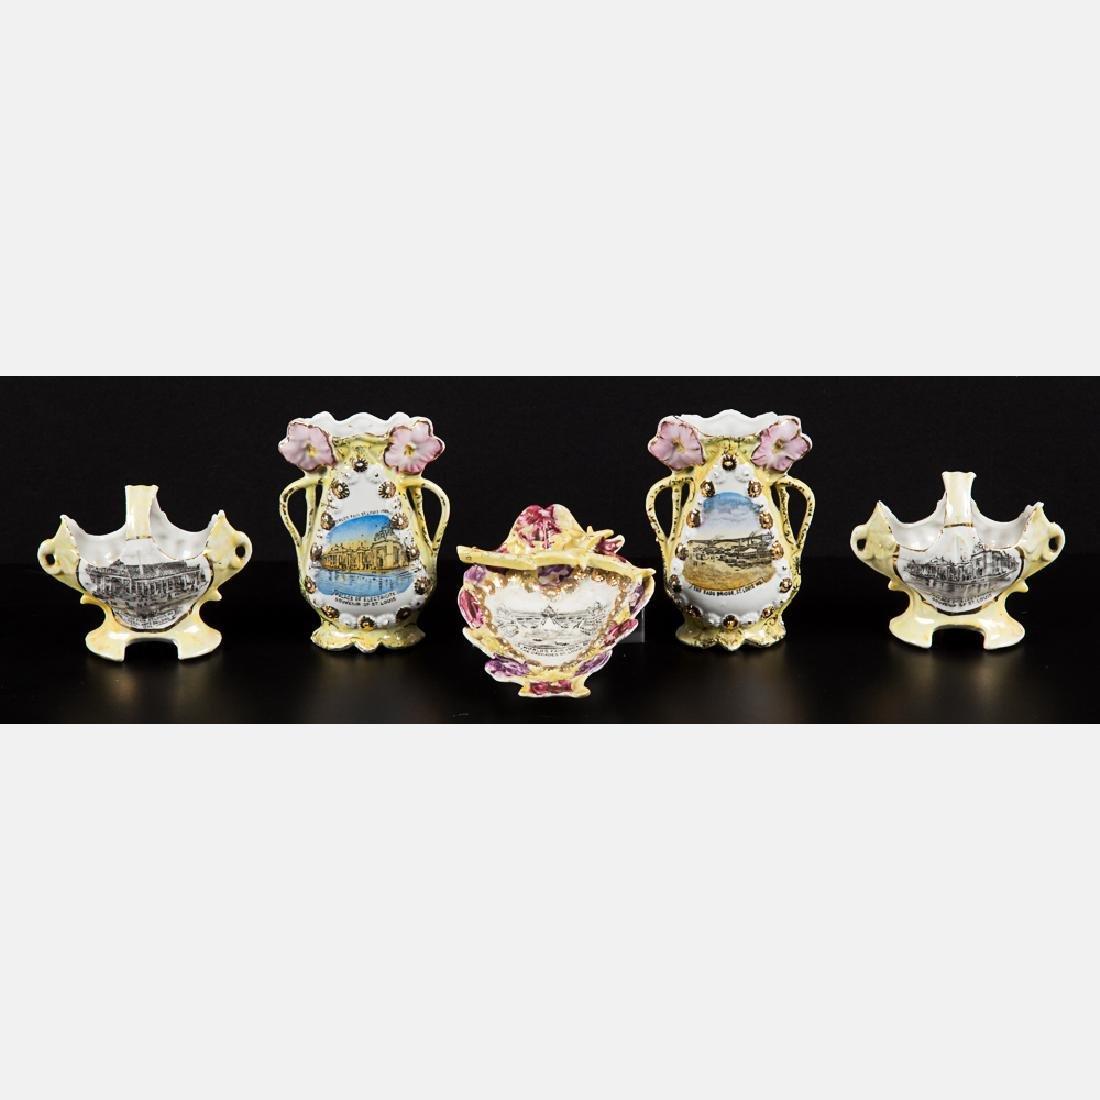 A Group of Five Porcelain Lustreware Decorative Items